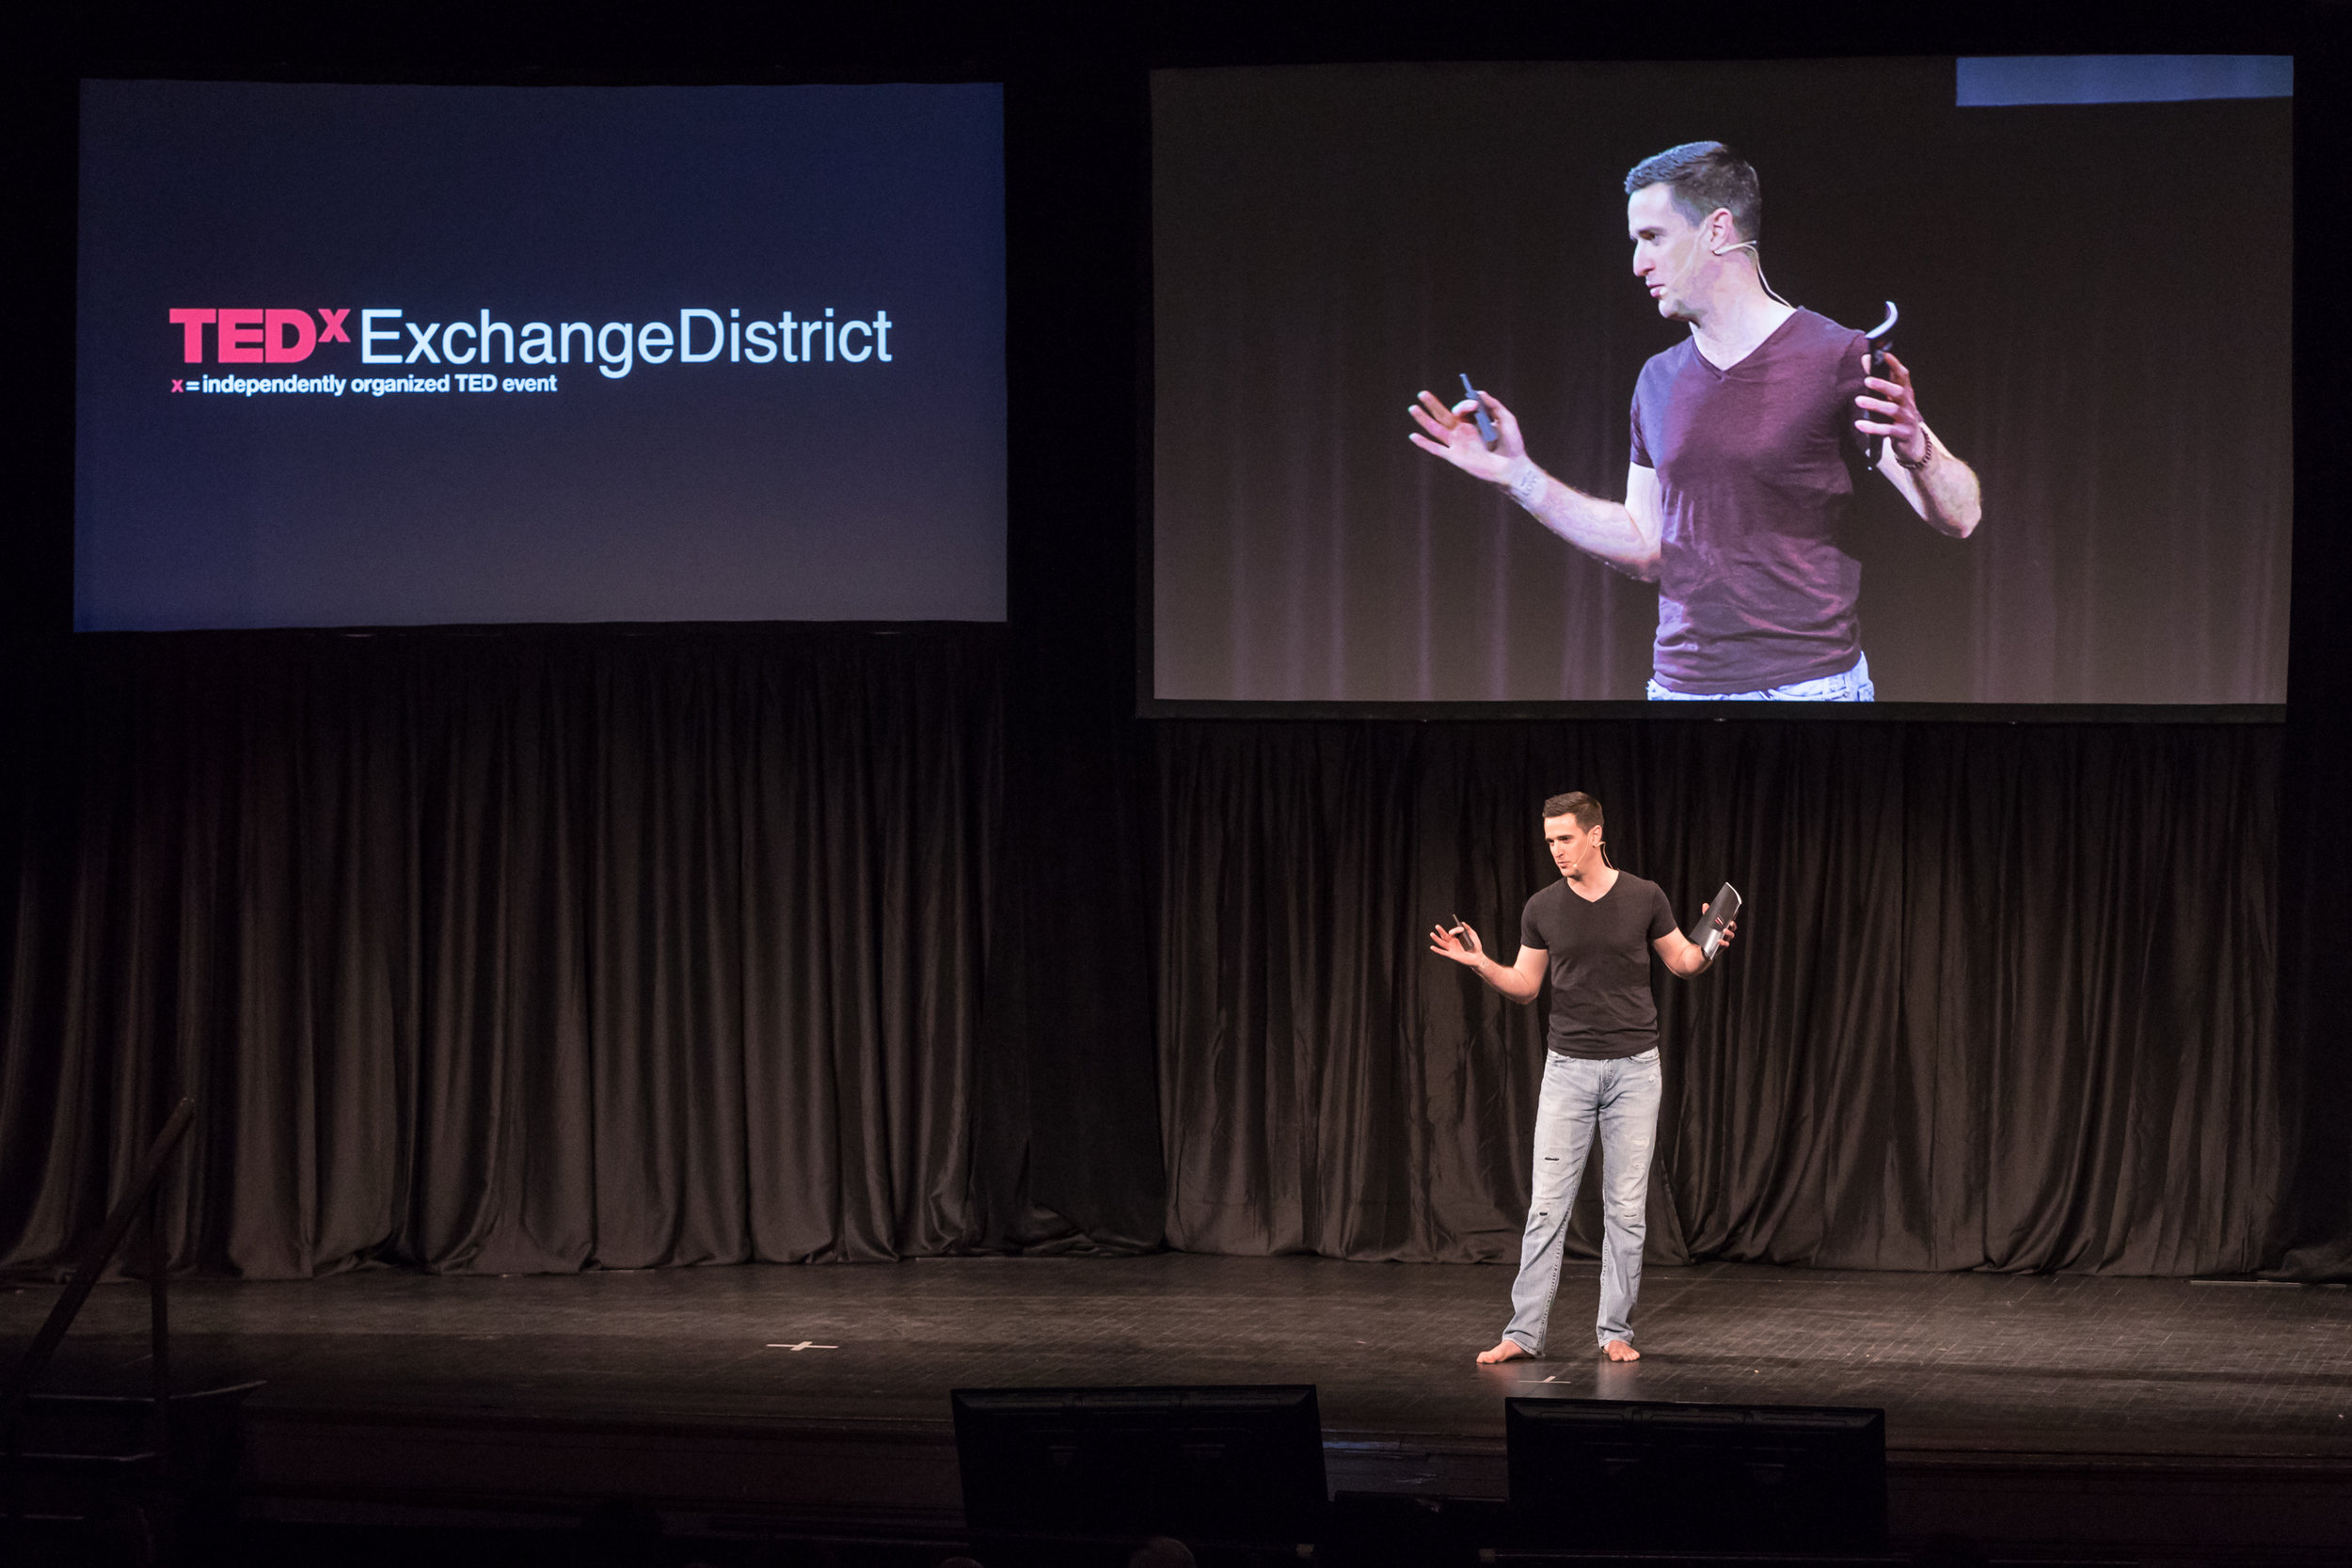 TEDx Exchange District